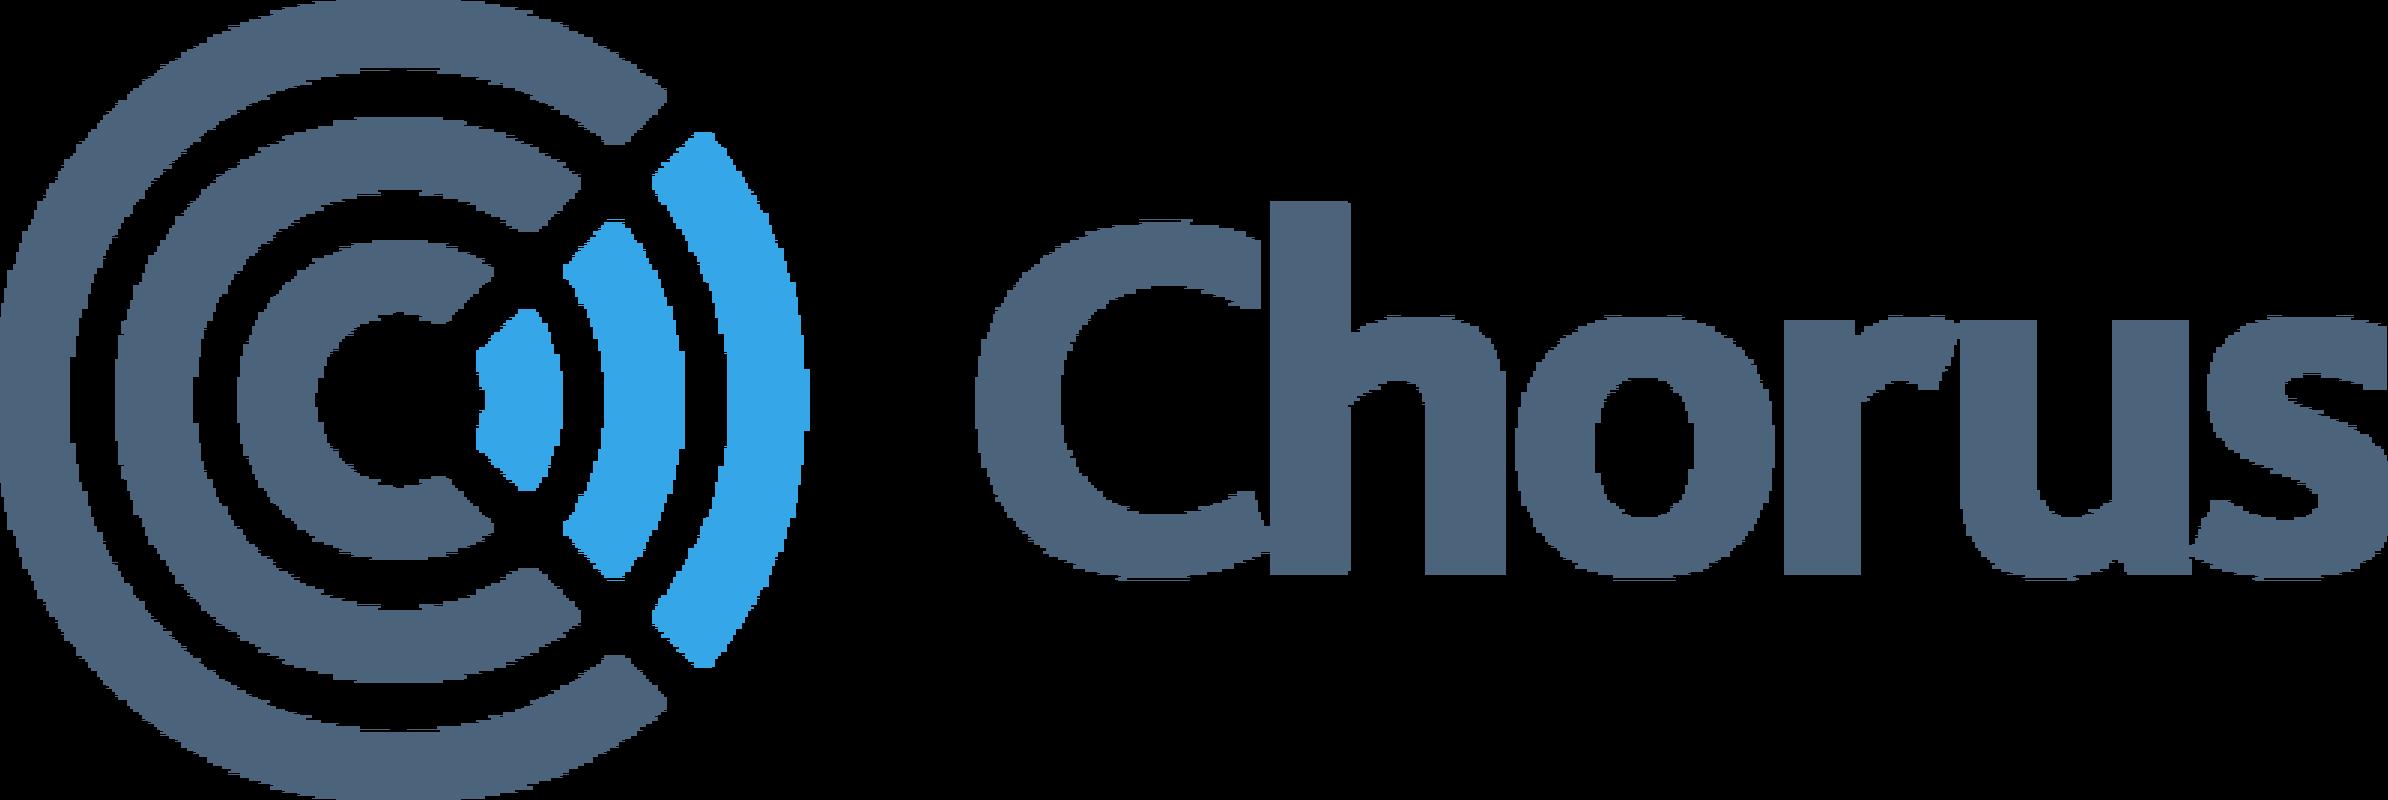 Chorus logo rgb w